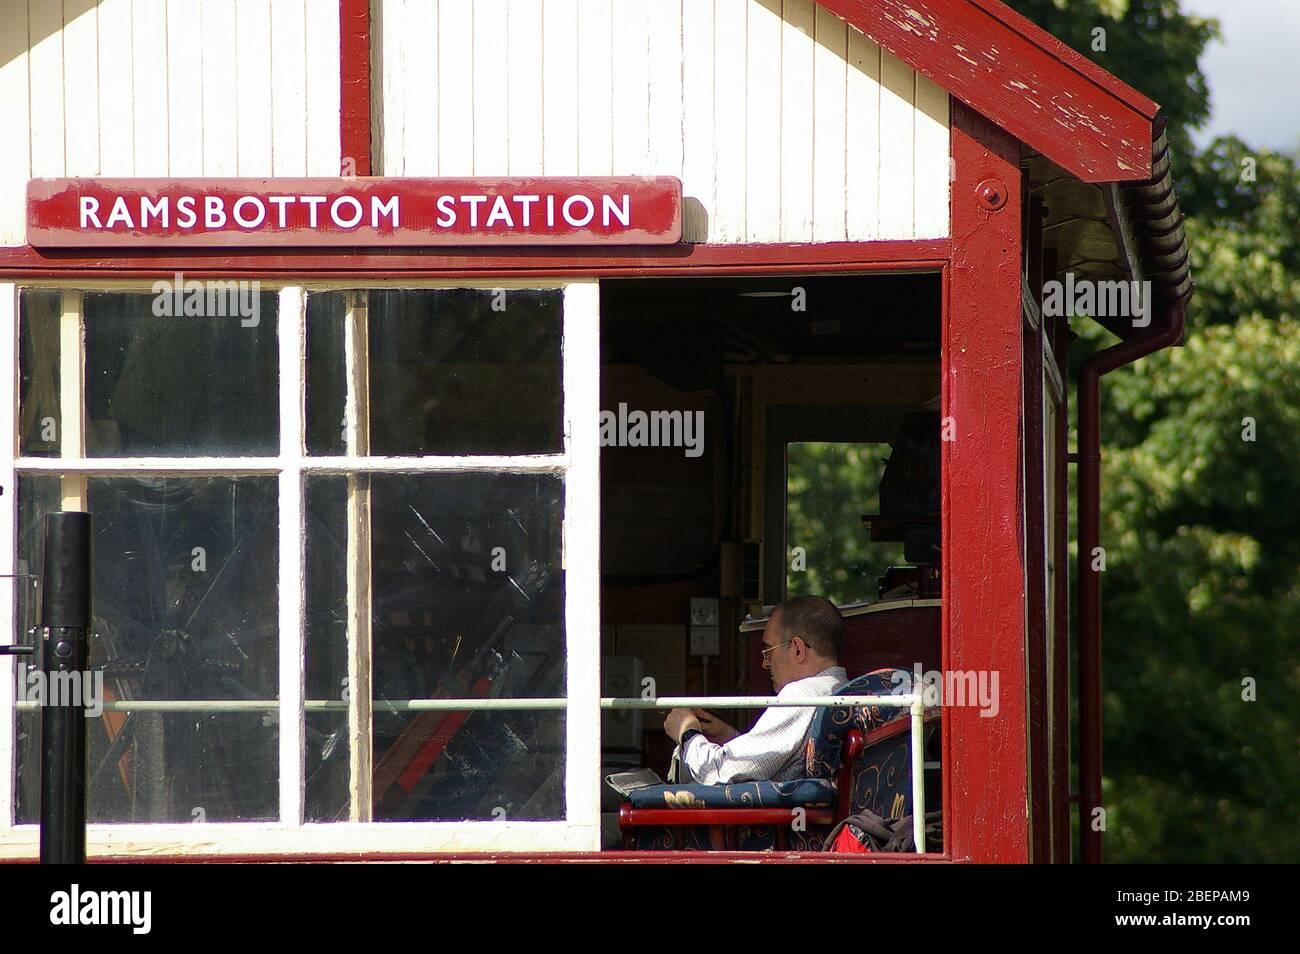 Ramsbottom, Lancashire, UK / August 24 2008: Railway signalman sitting in the signal box at Ramsbottom station on the historic East Lancashire Railway Stock Photo